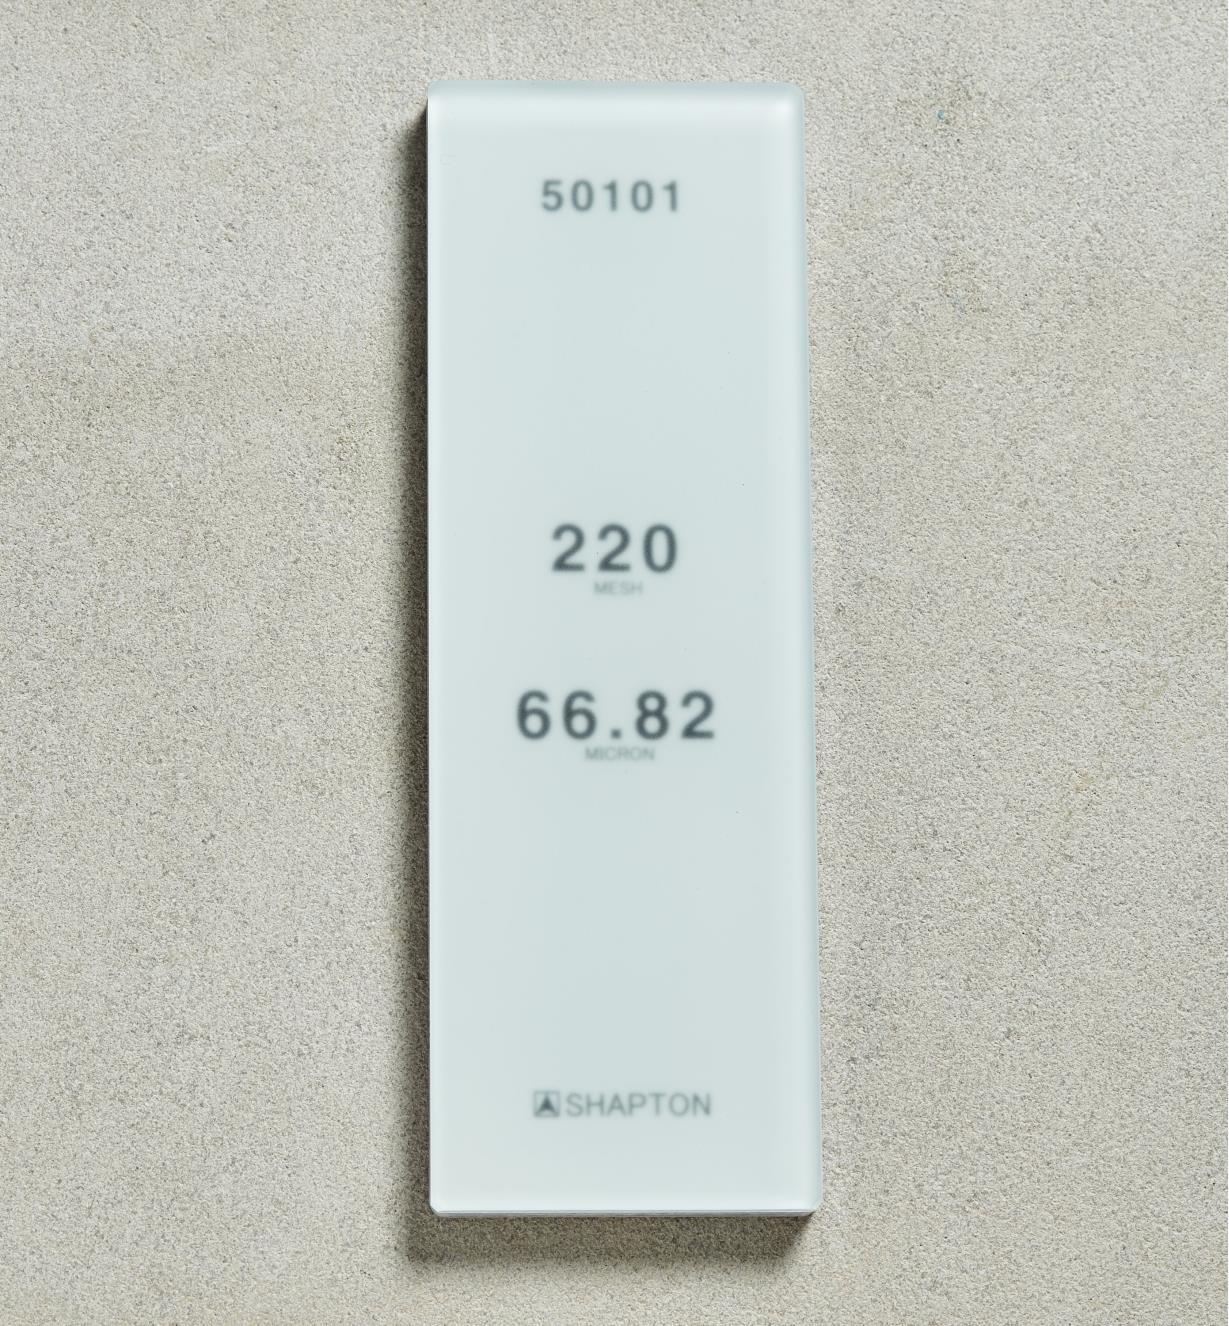 61M0302 - Shapton GlassStone HR Stone 6682µ 220x